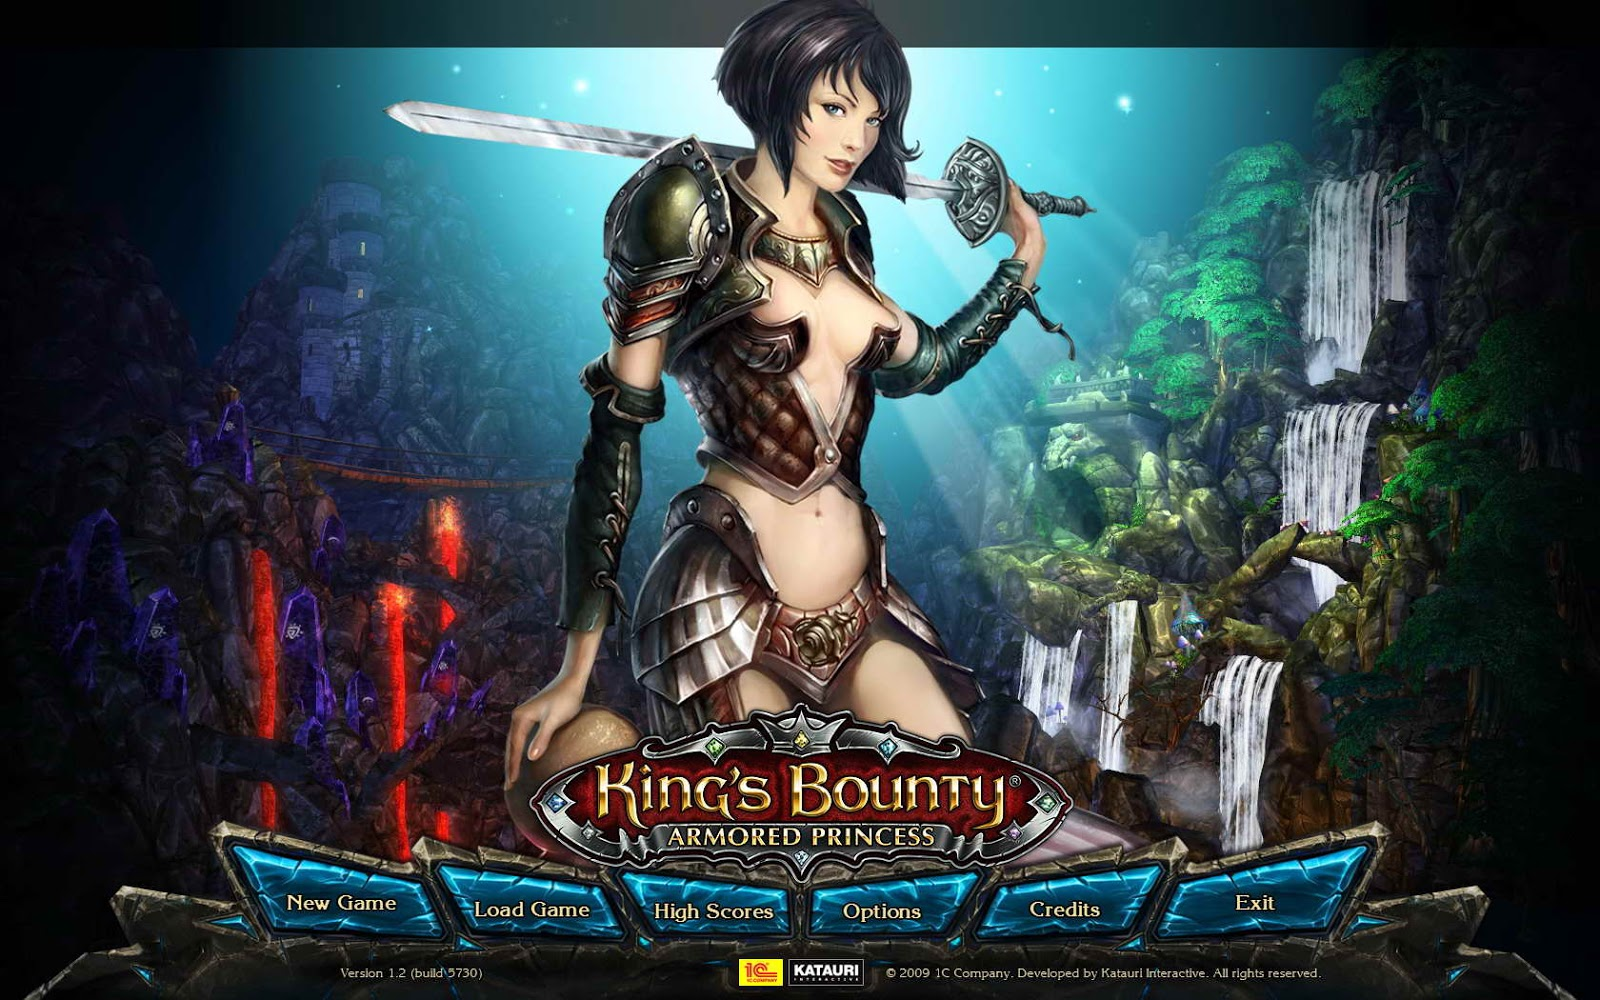 Kings Bounty Armored Princess PC game